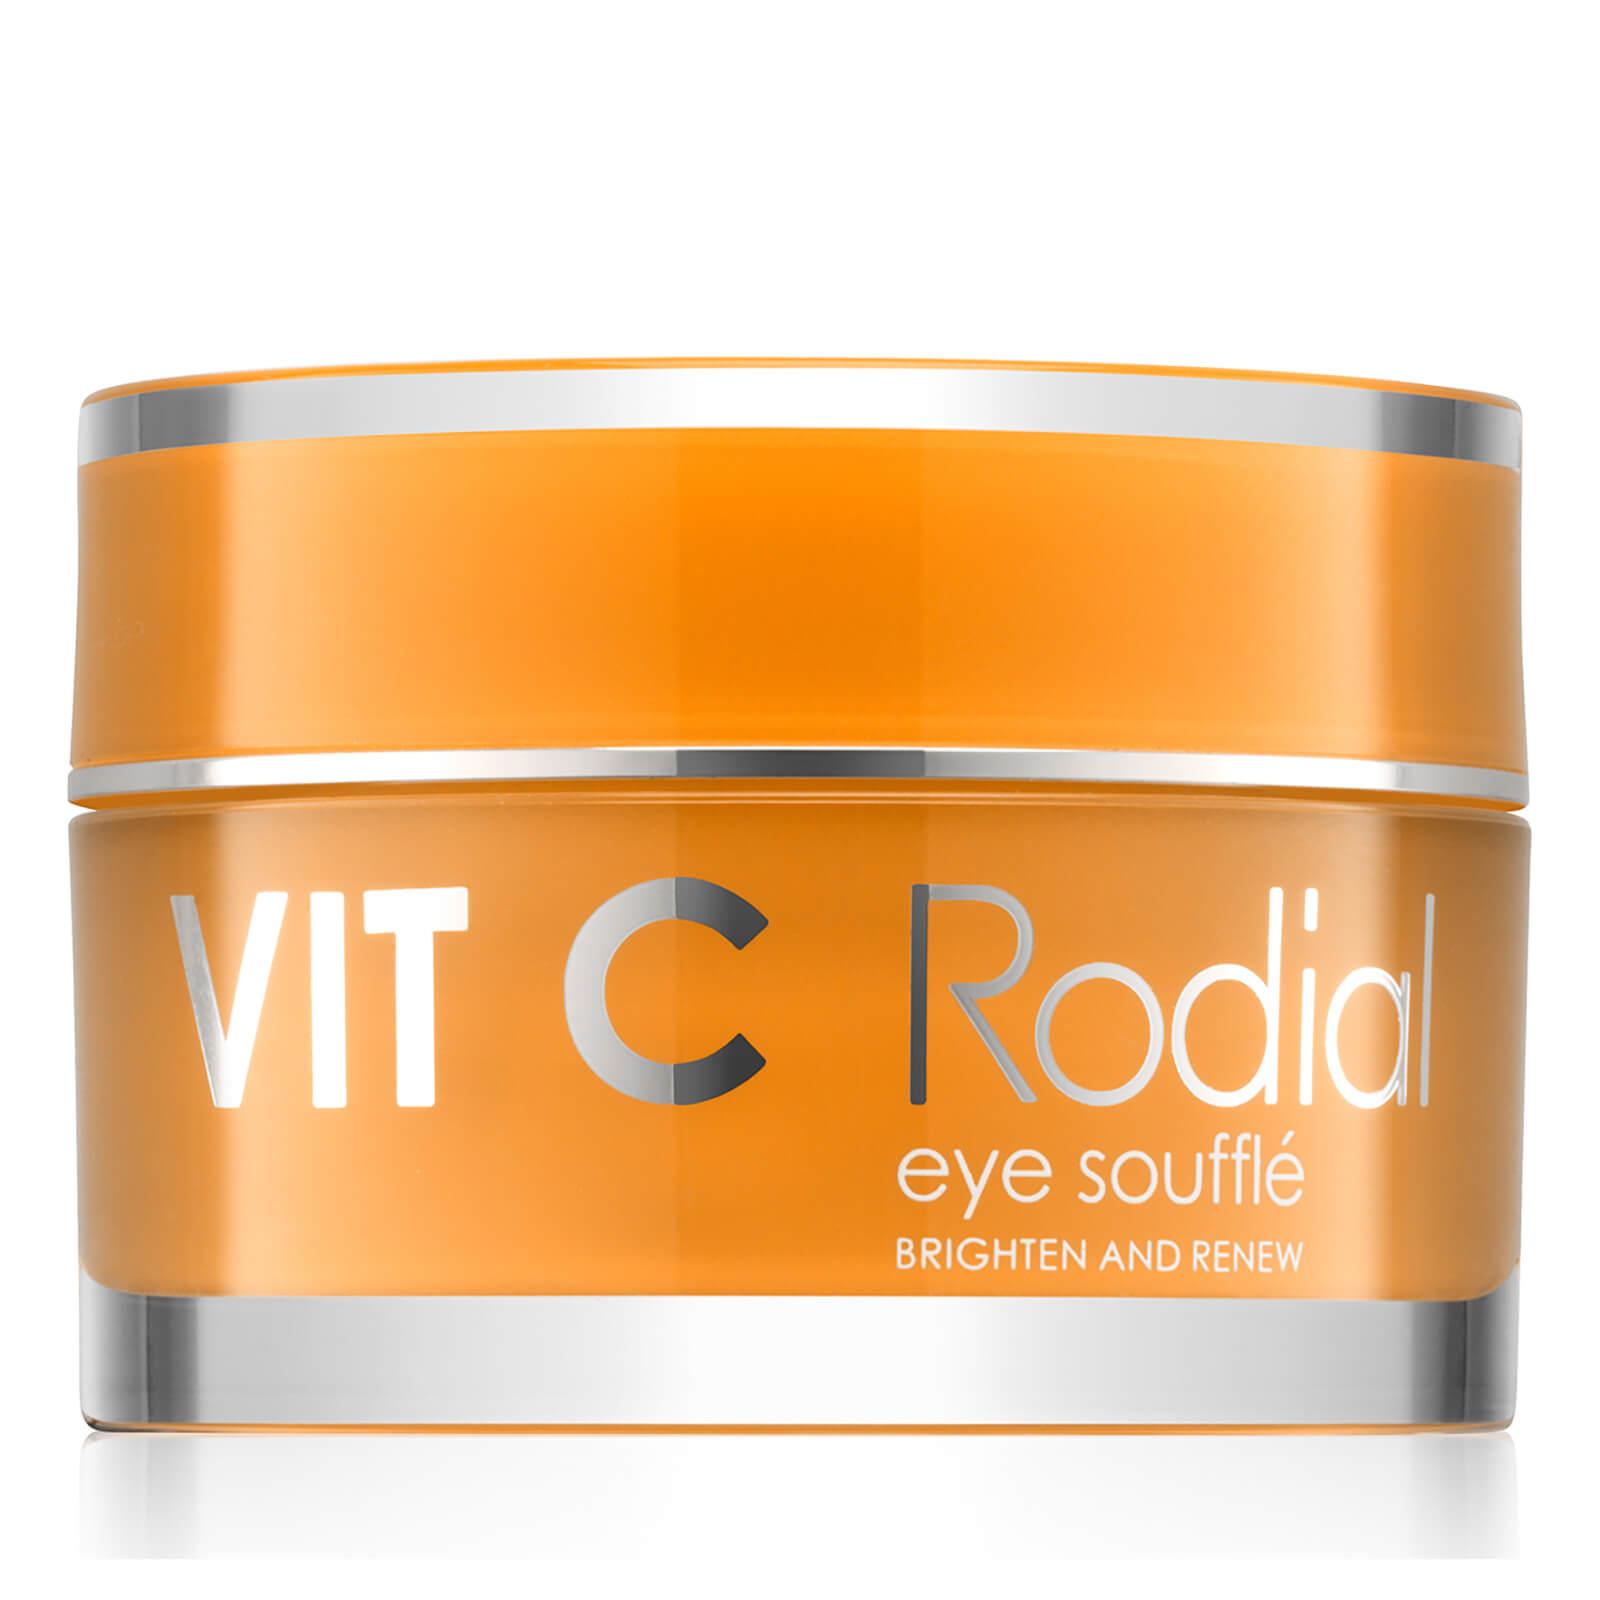 Rodial Vitamin C Eye Soufflé